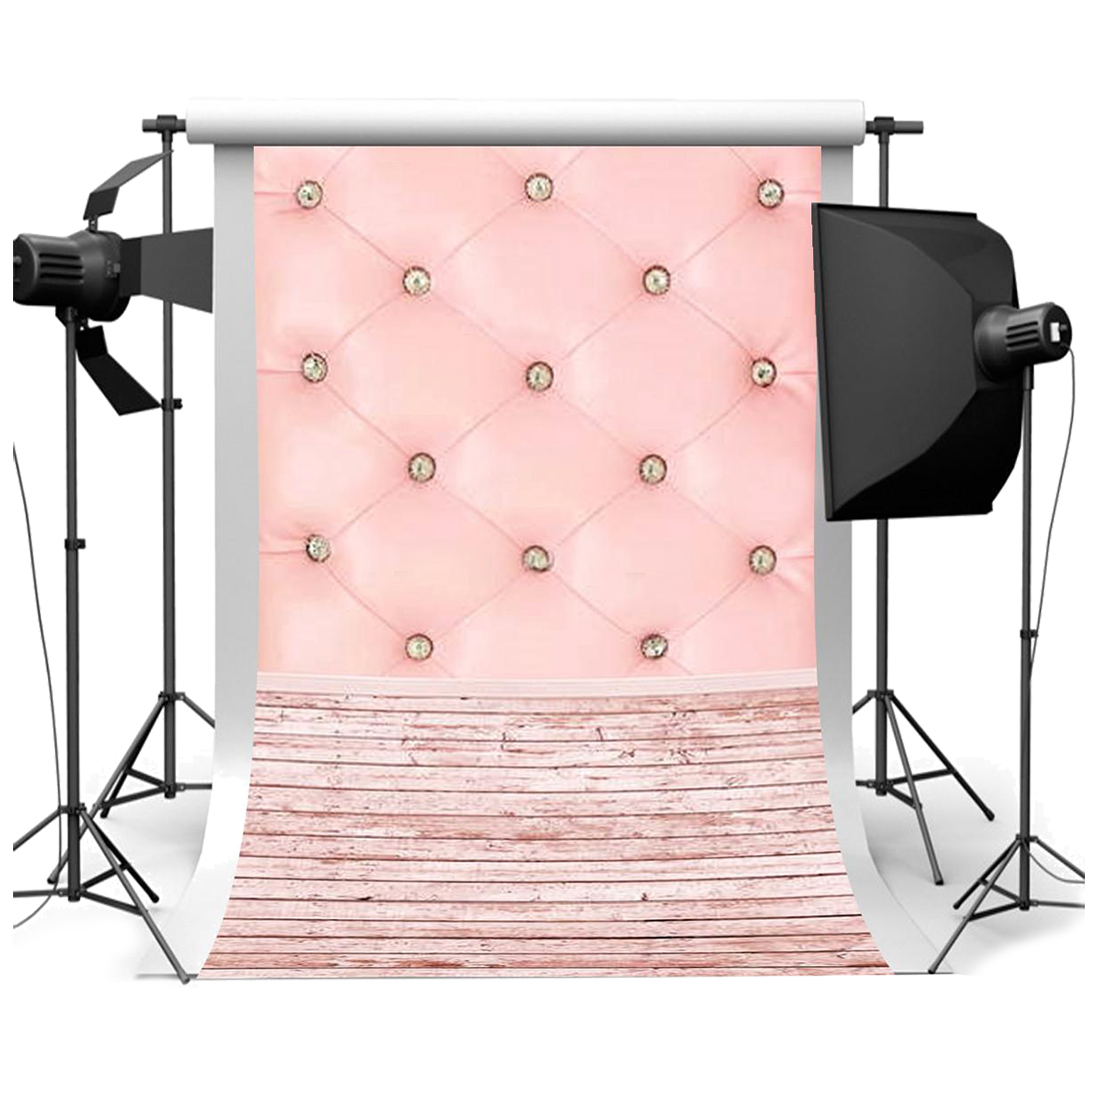 3x5FT Vinyl Photography Backdrop Wall Photo Background pink 3x5ft vinyl photography backdrop wall photo background dark gray